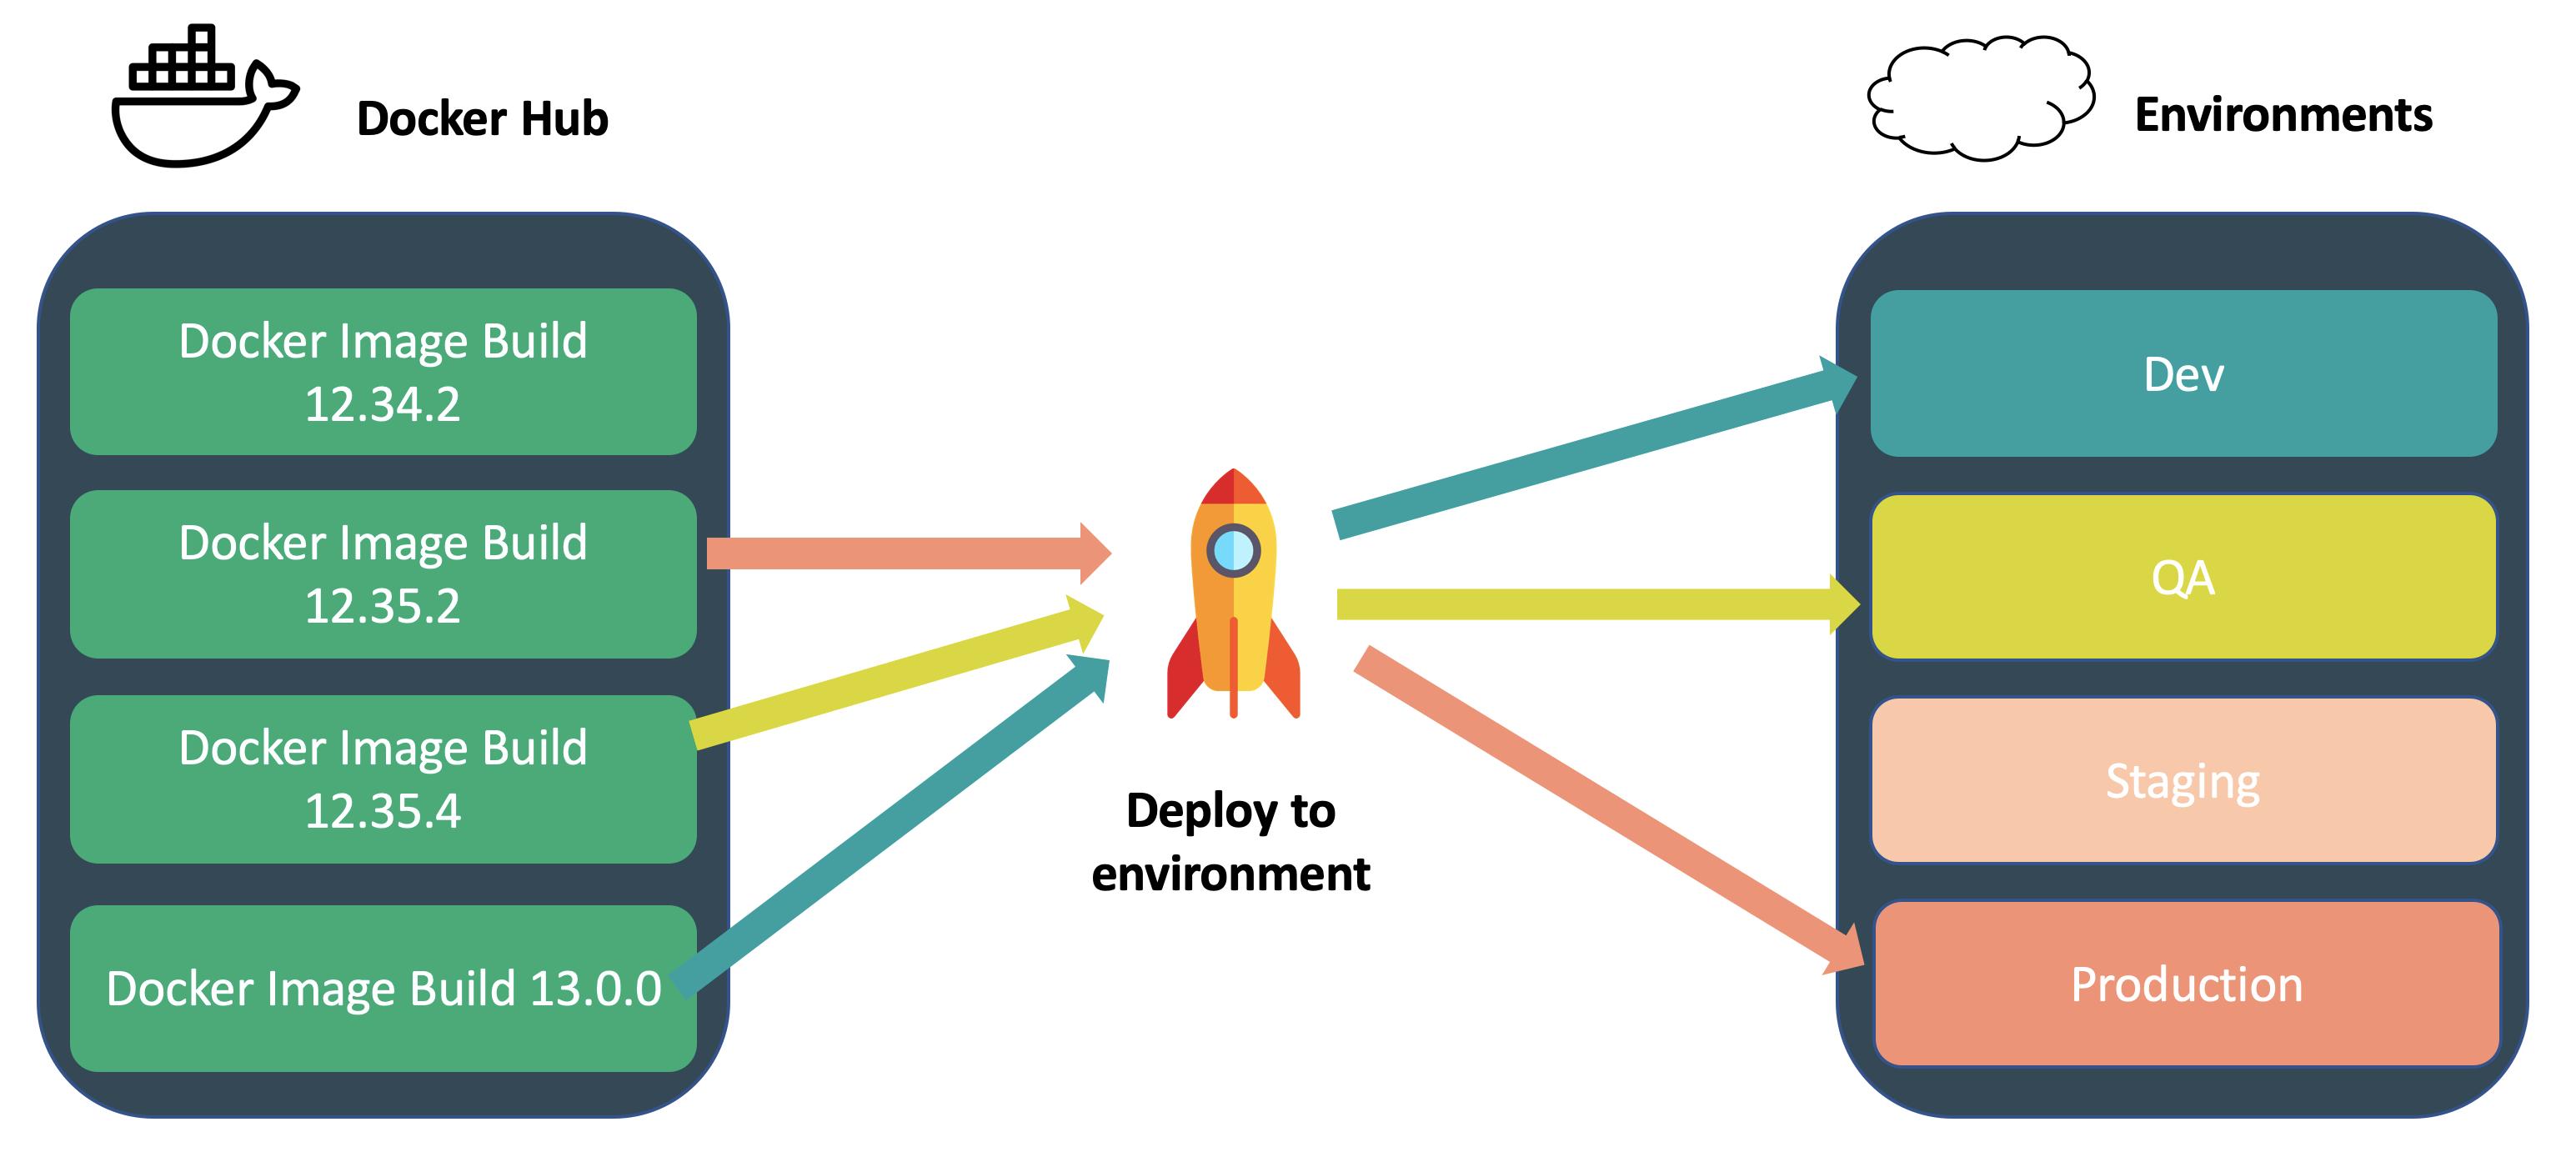 Managing multiple environments